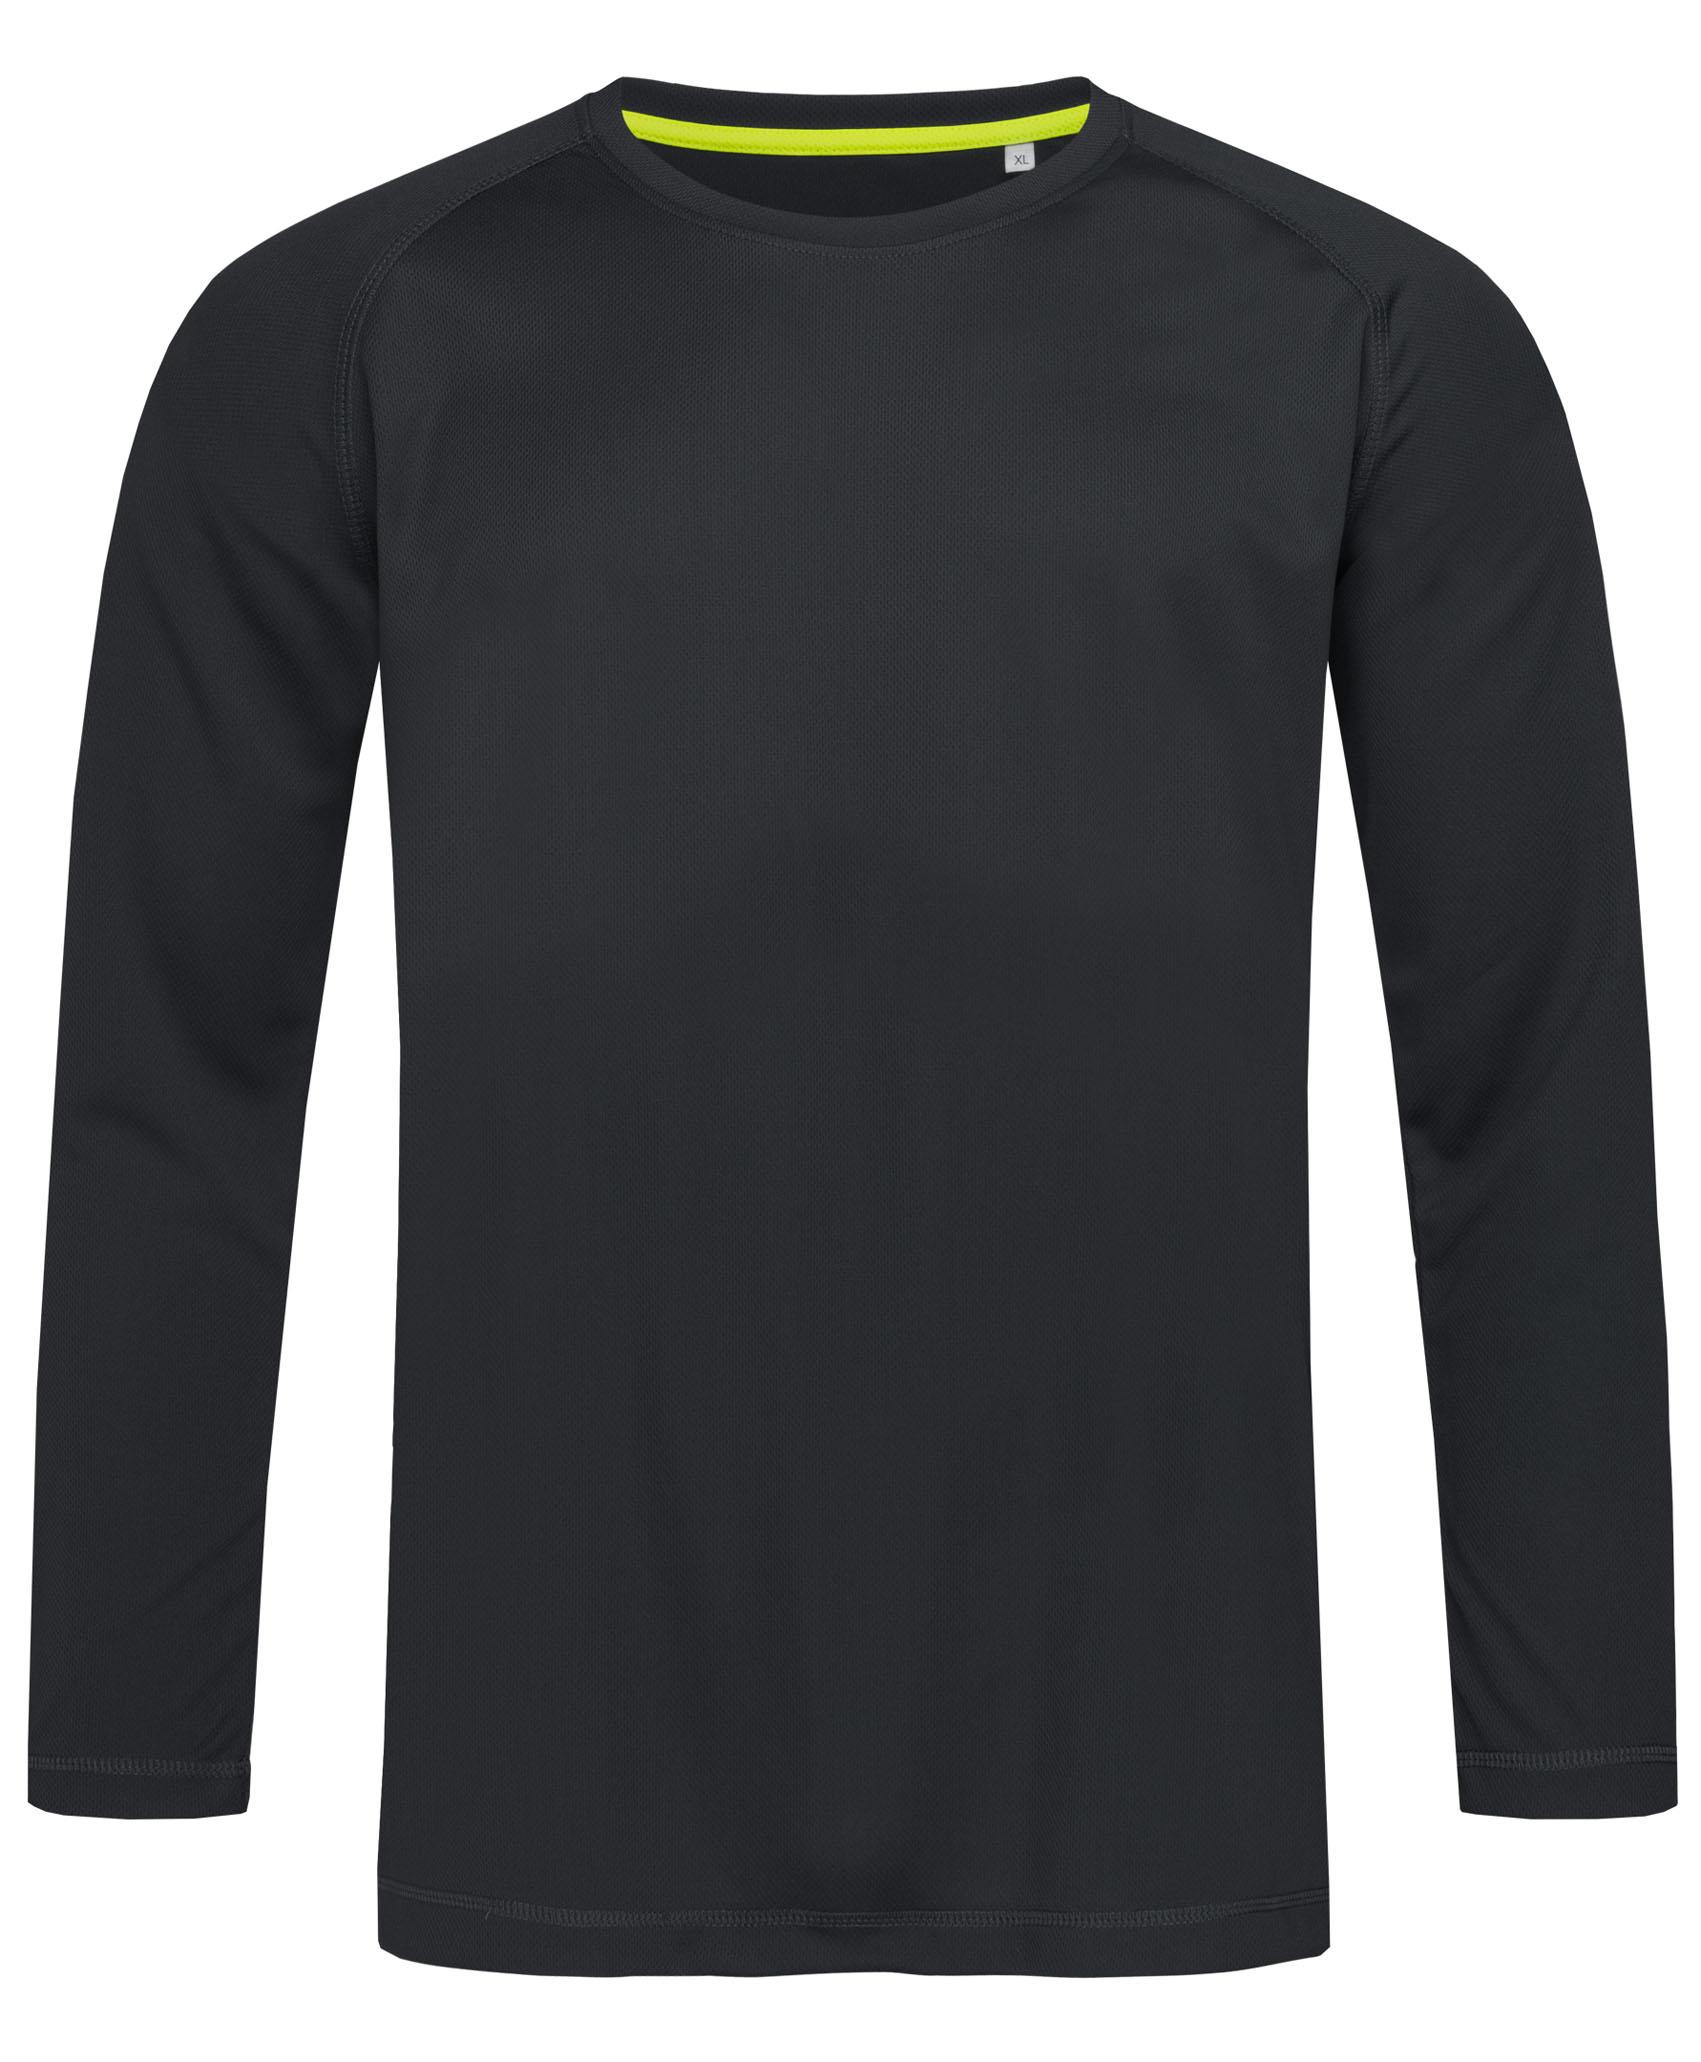 Stedman T-shirt Mesh ActiveDry LS